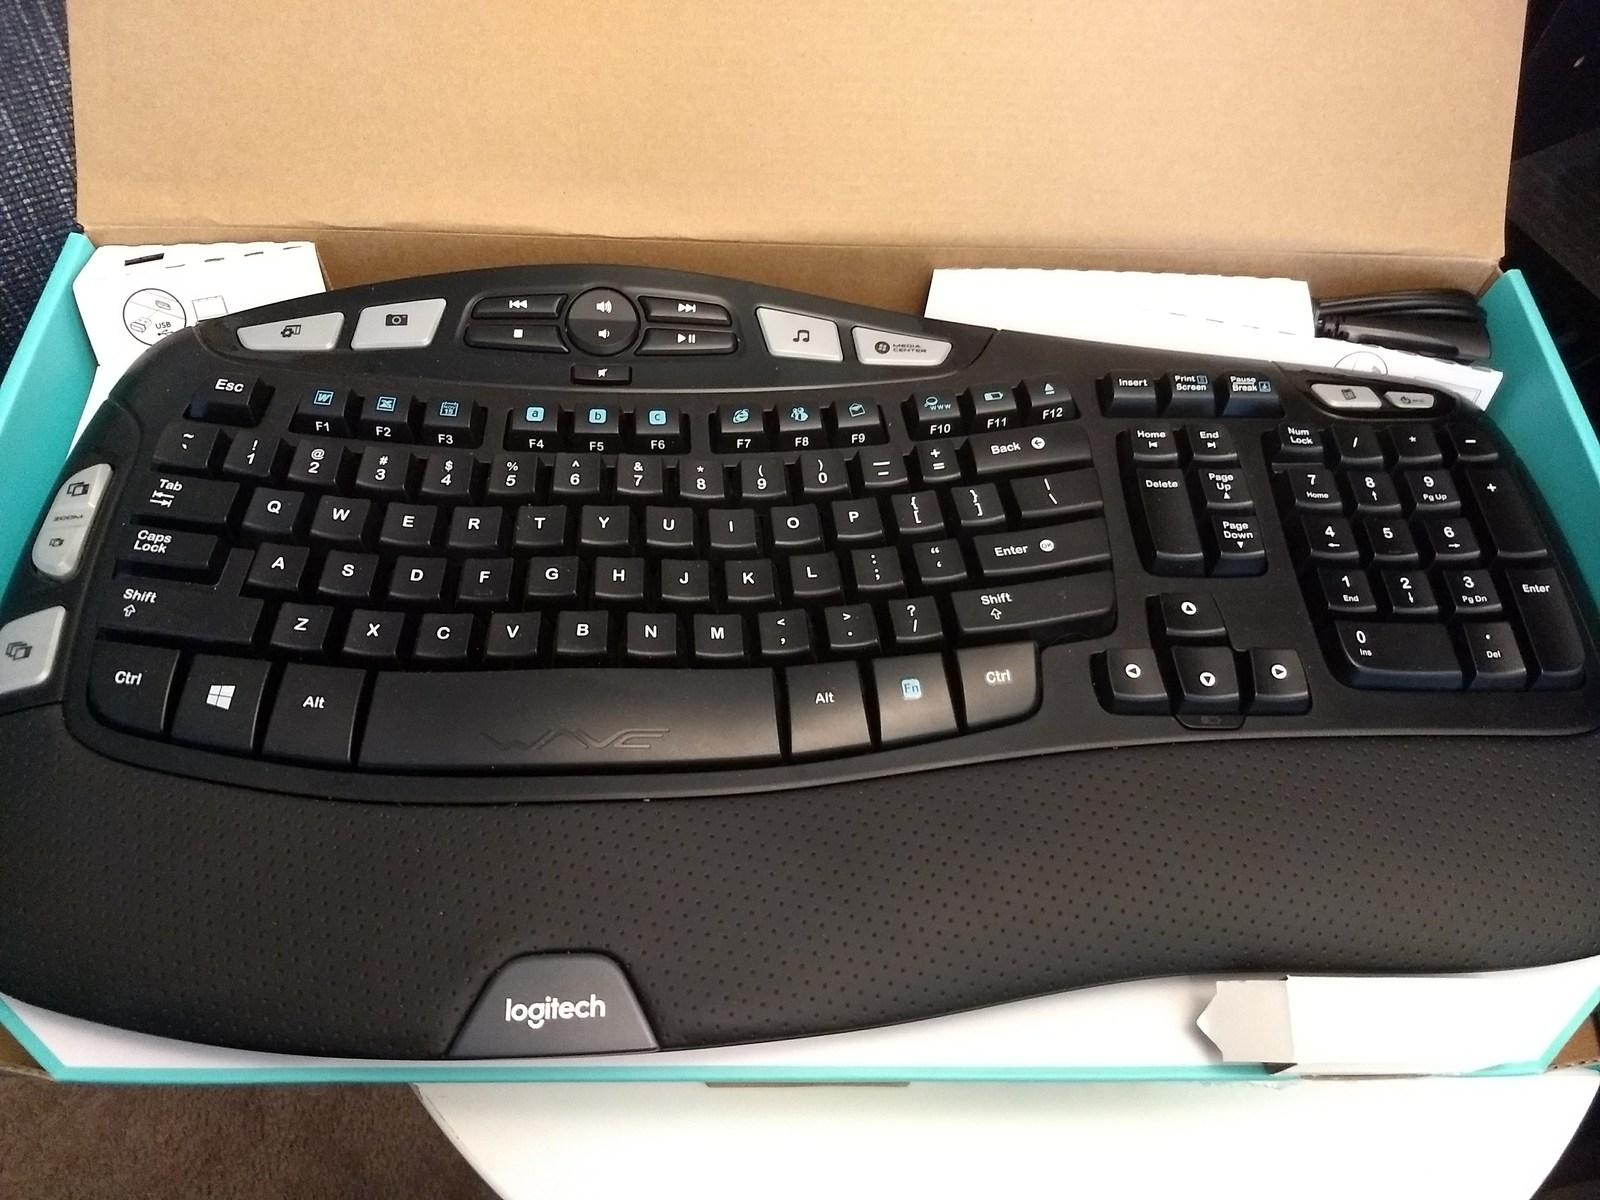 Logitech MK550 Comfort Wave Wireless Keyboard Combo image 3